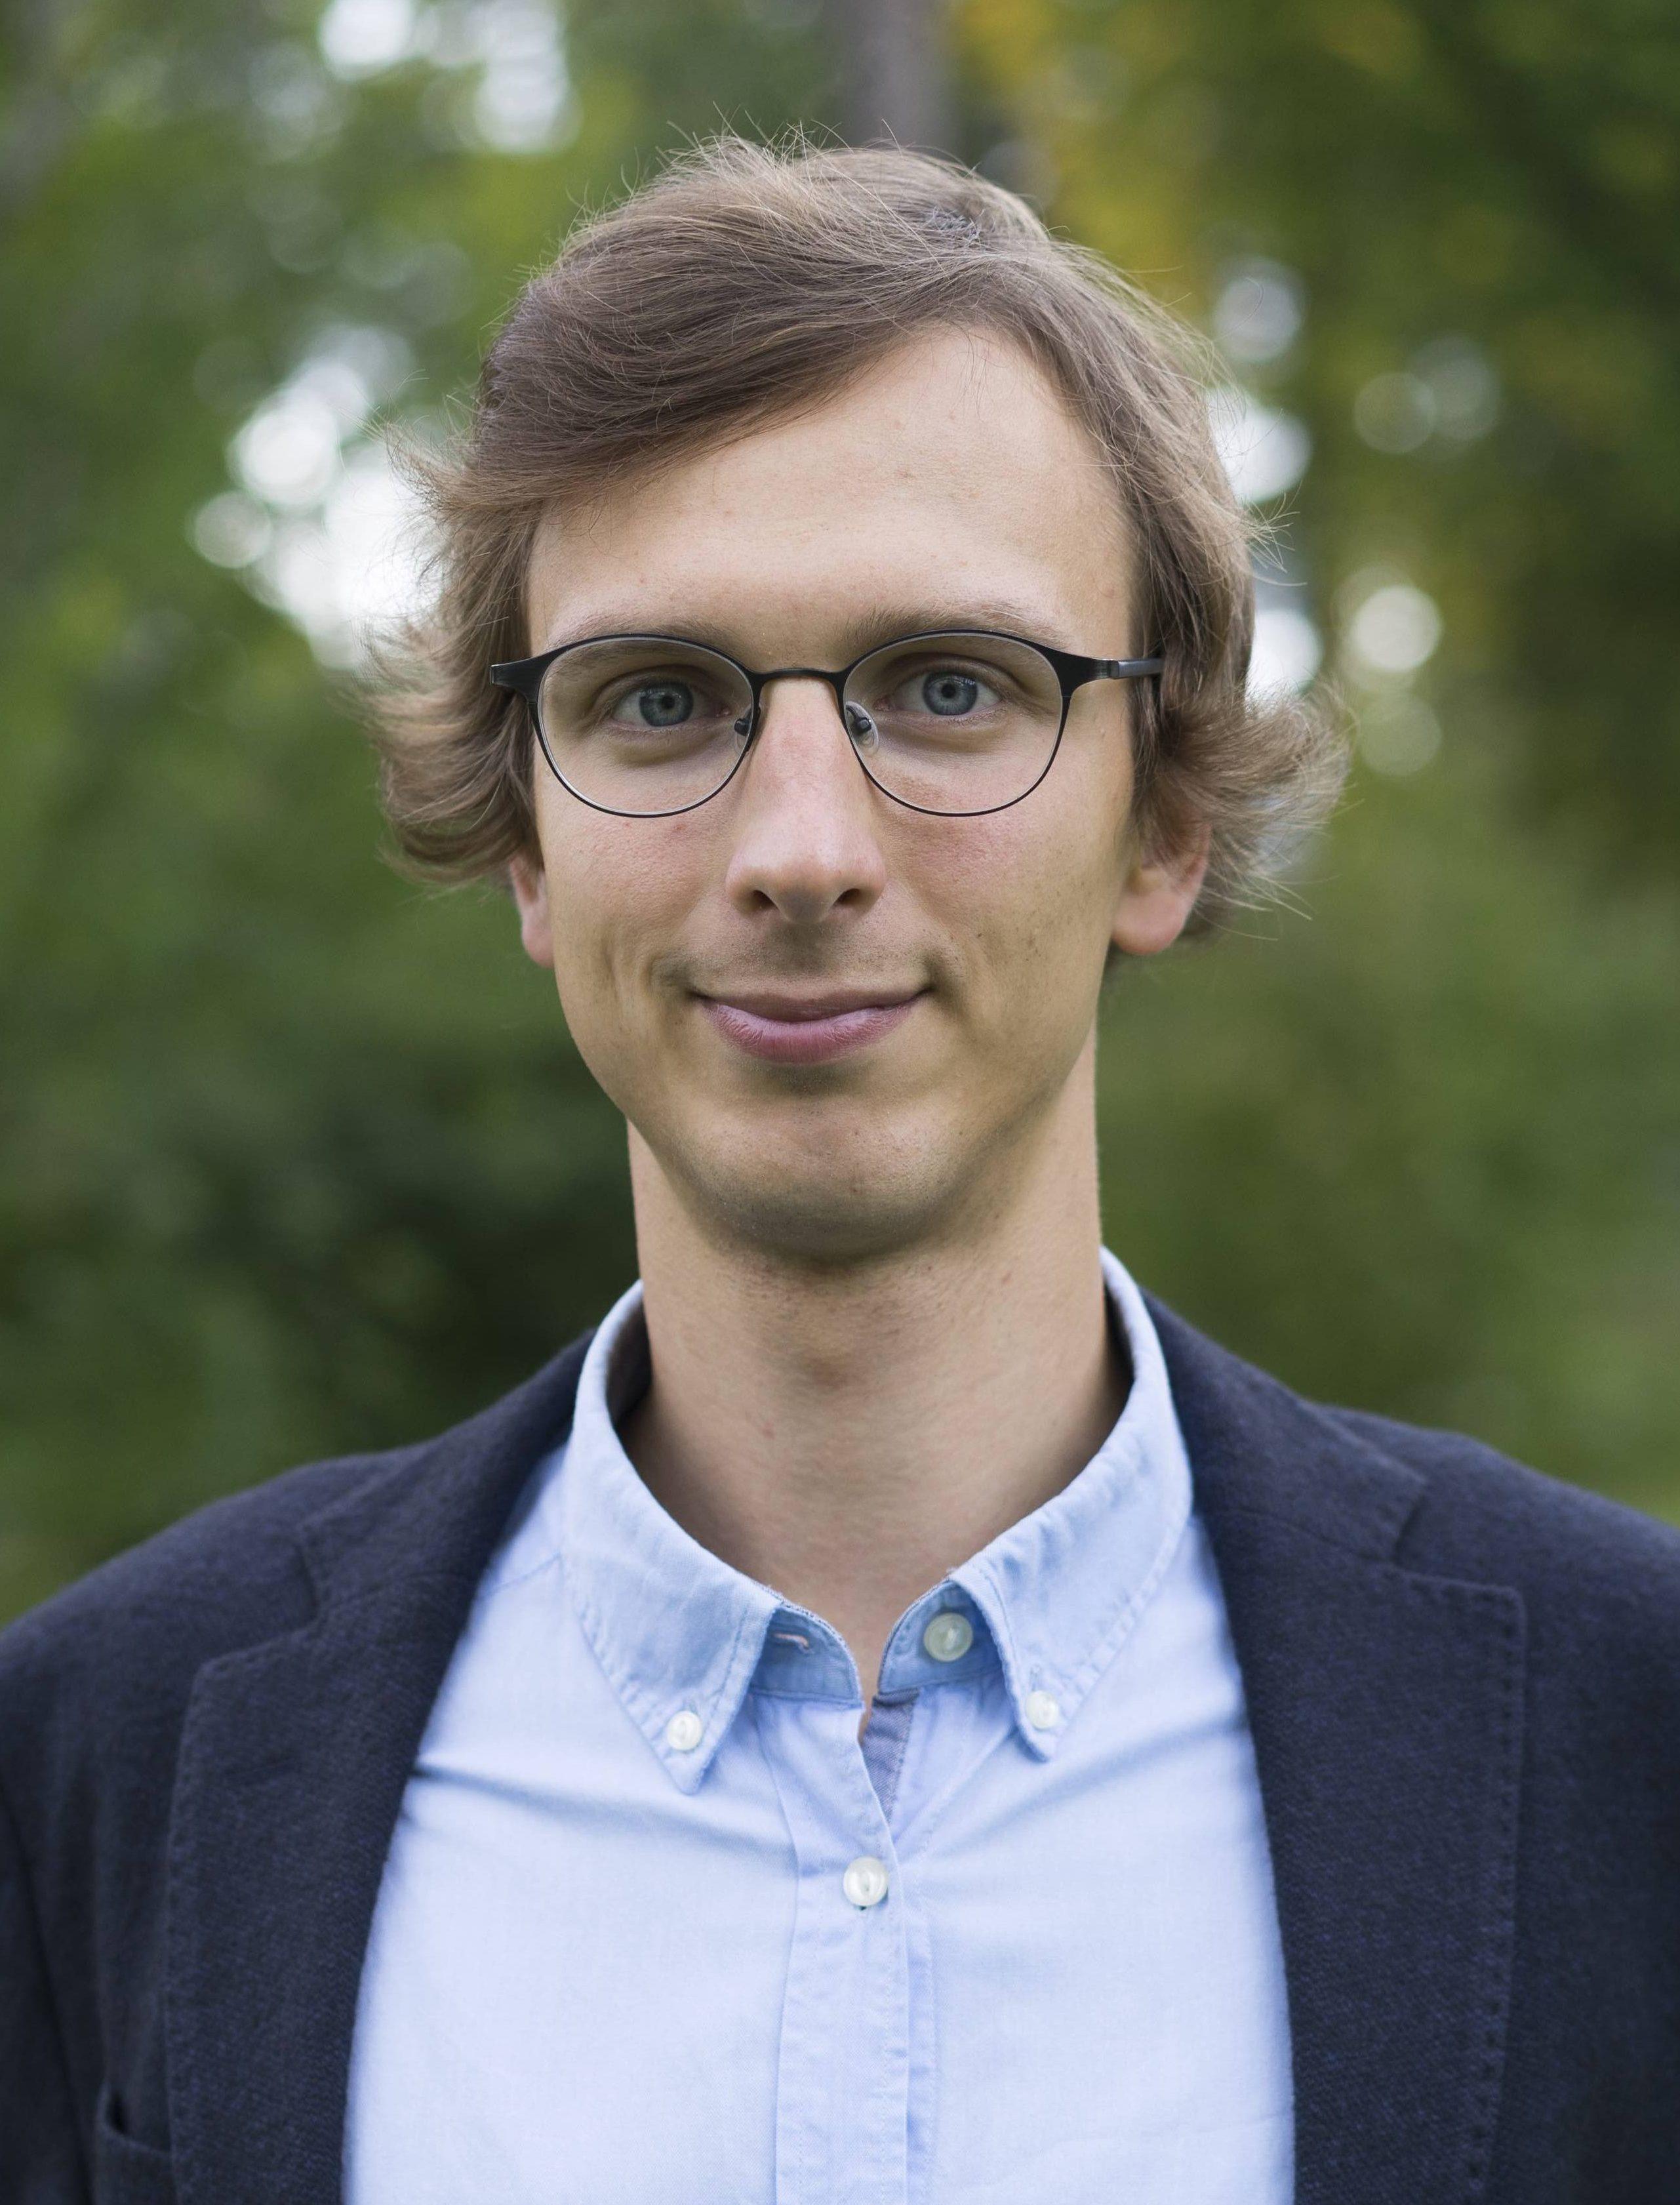 Juozas Vaicenavicius